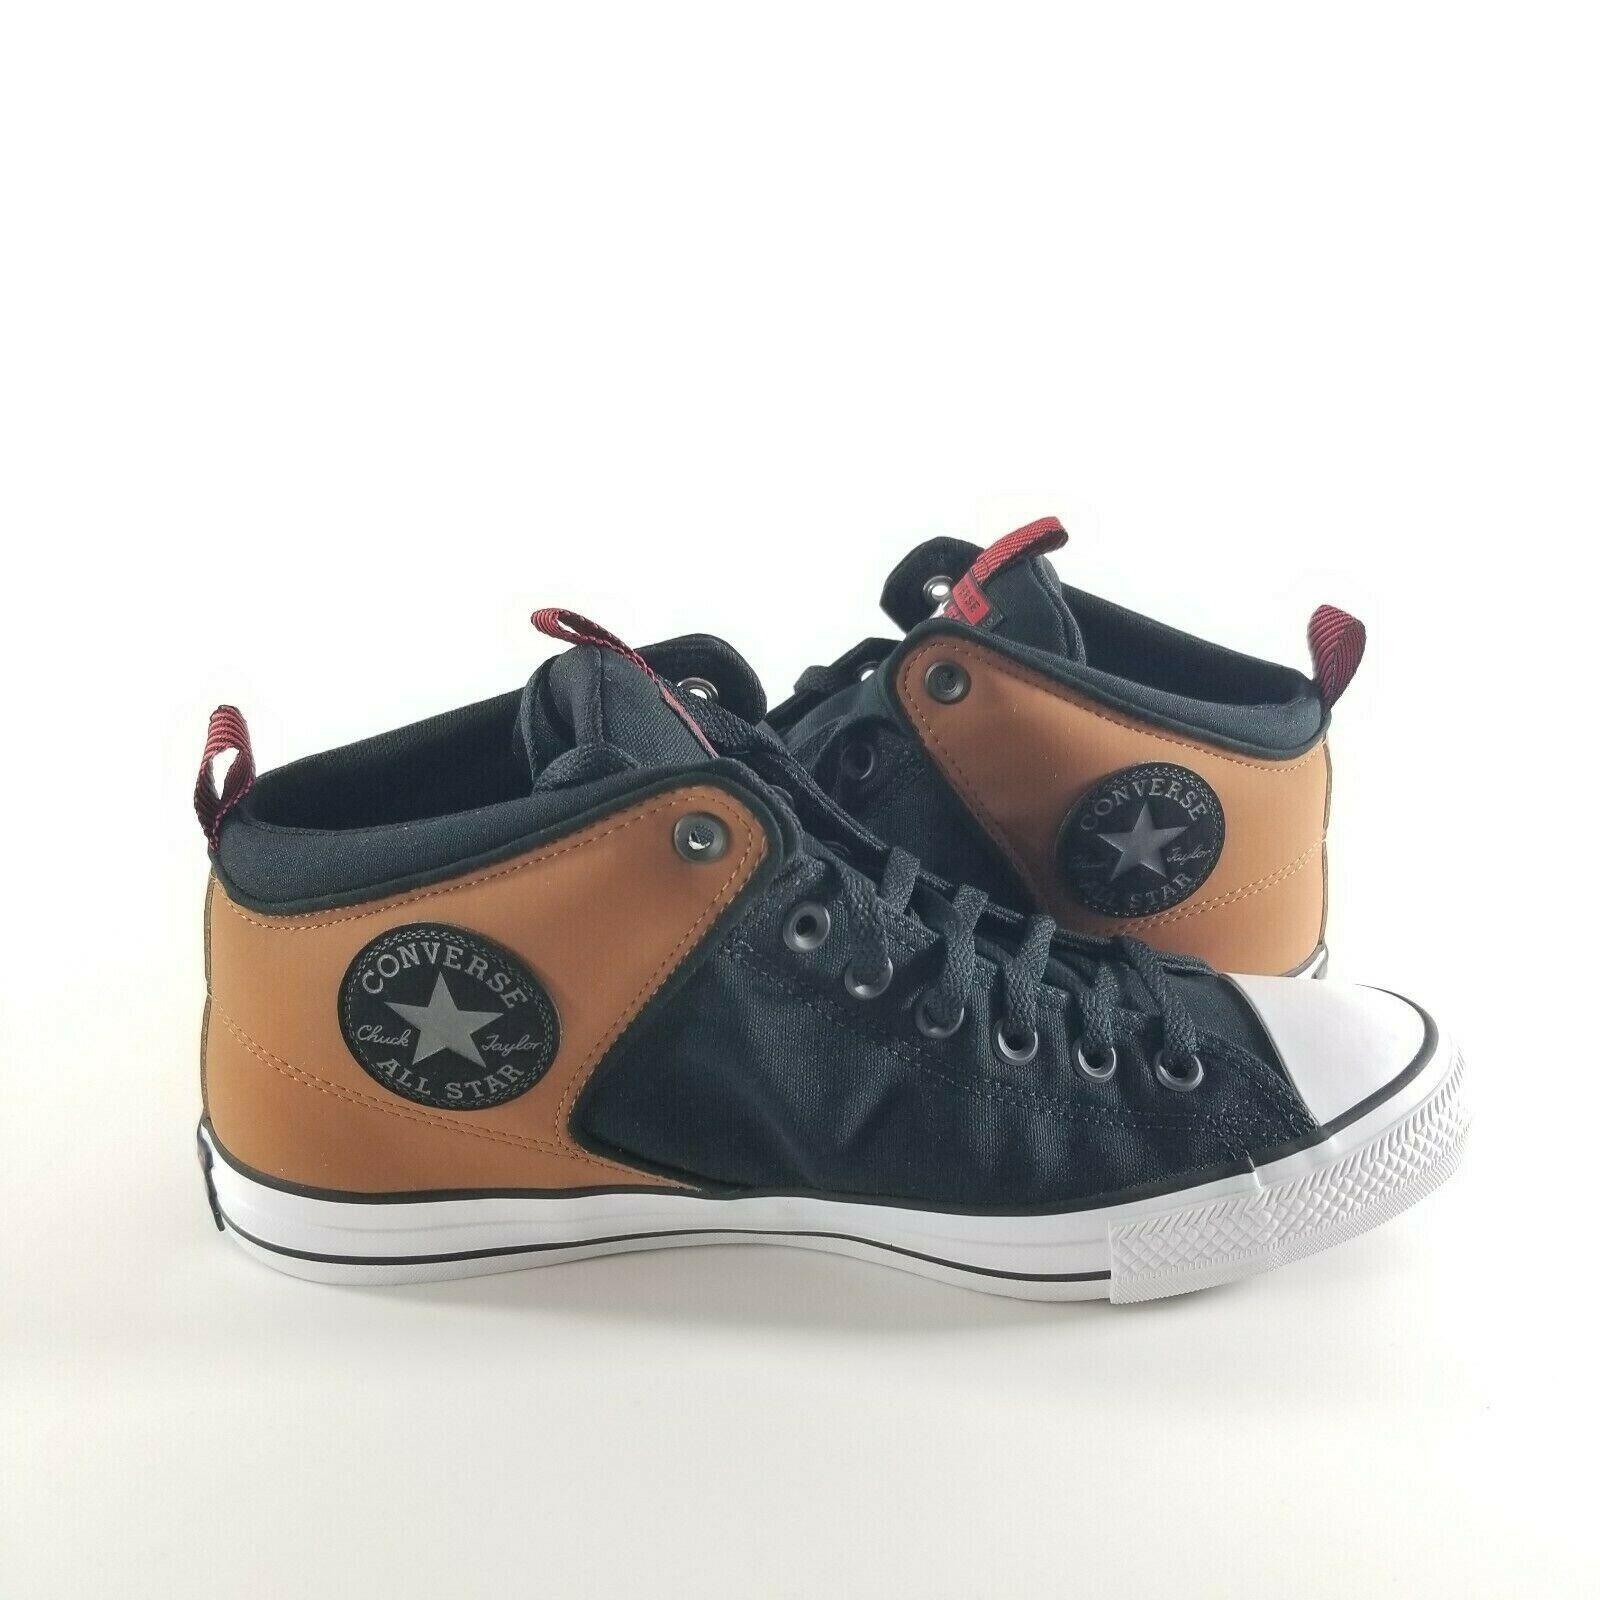 NEW Converse CTAS High Street Mid Unisex Size Shoes Black/White/Tan 166077C